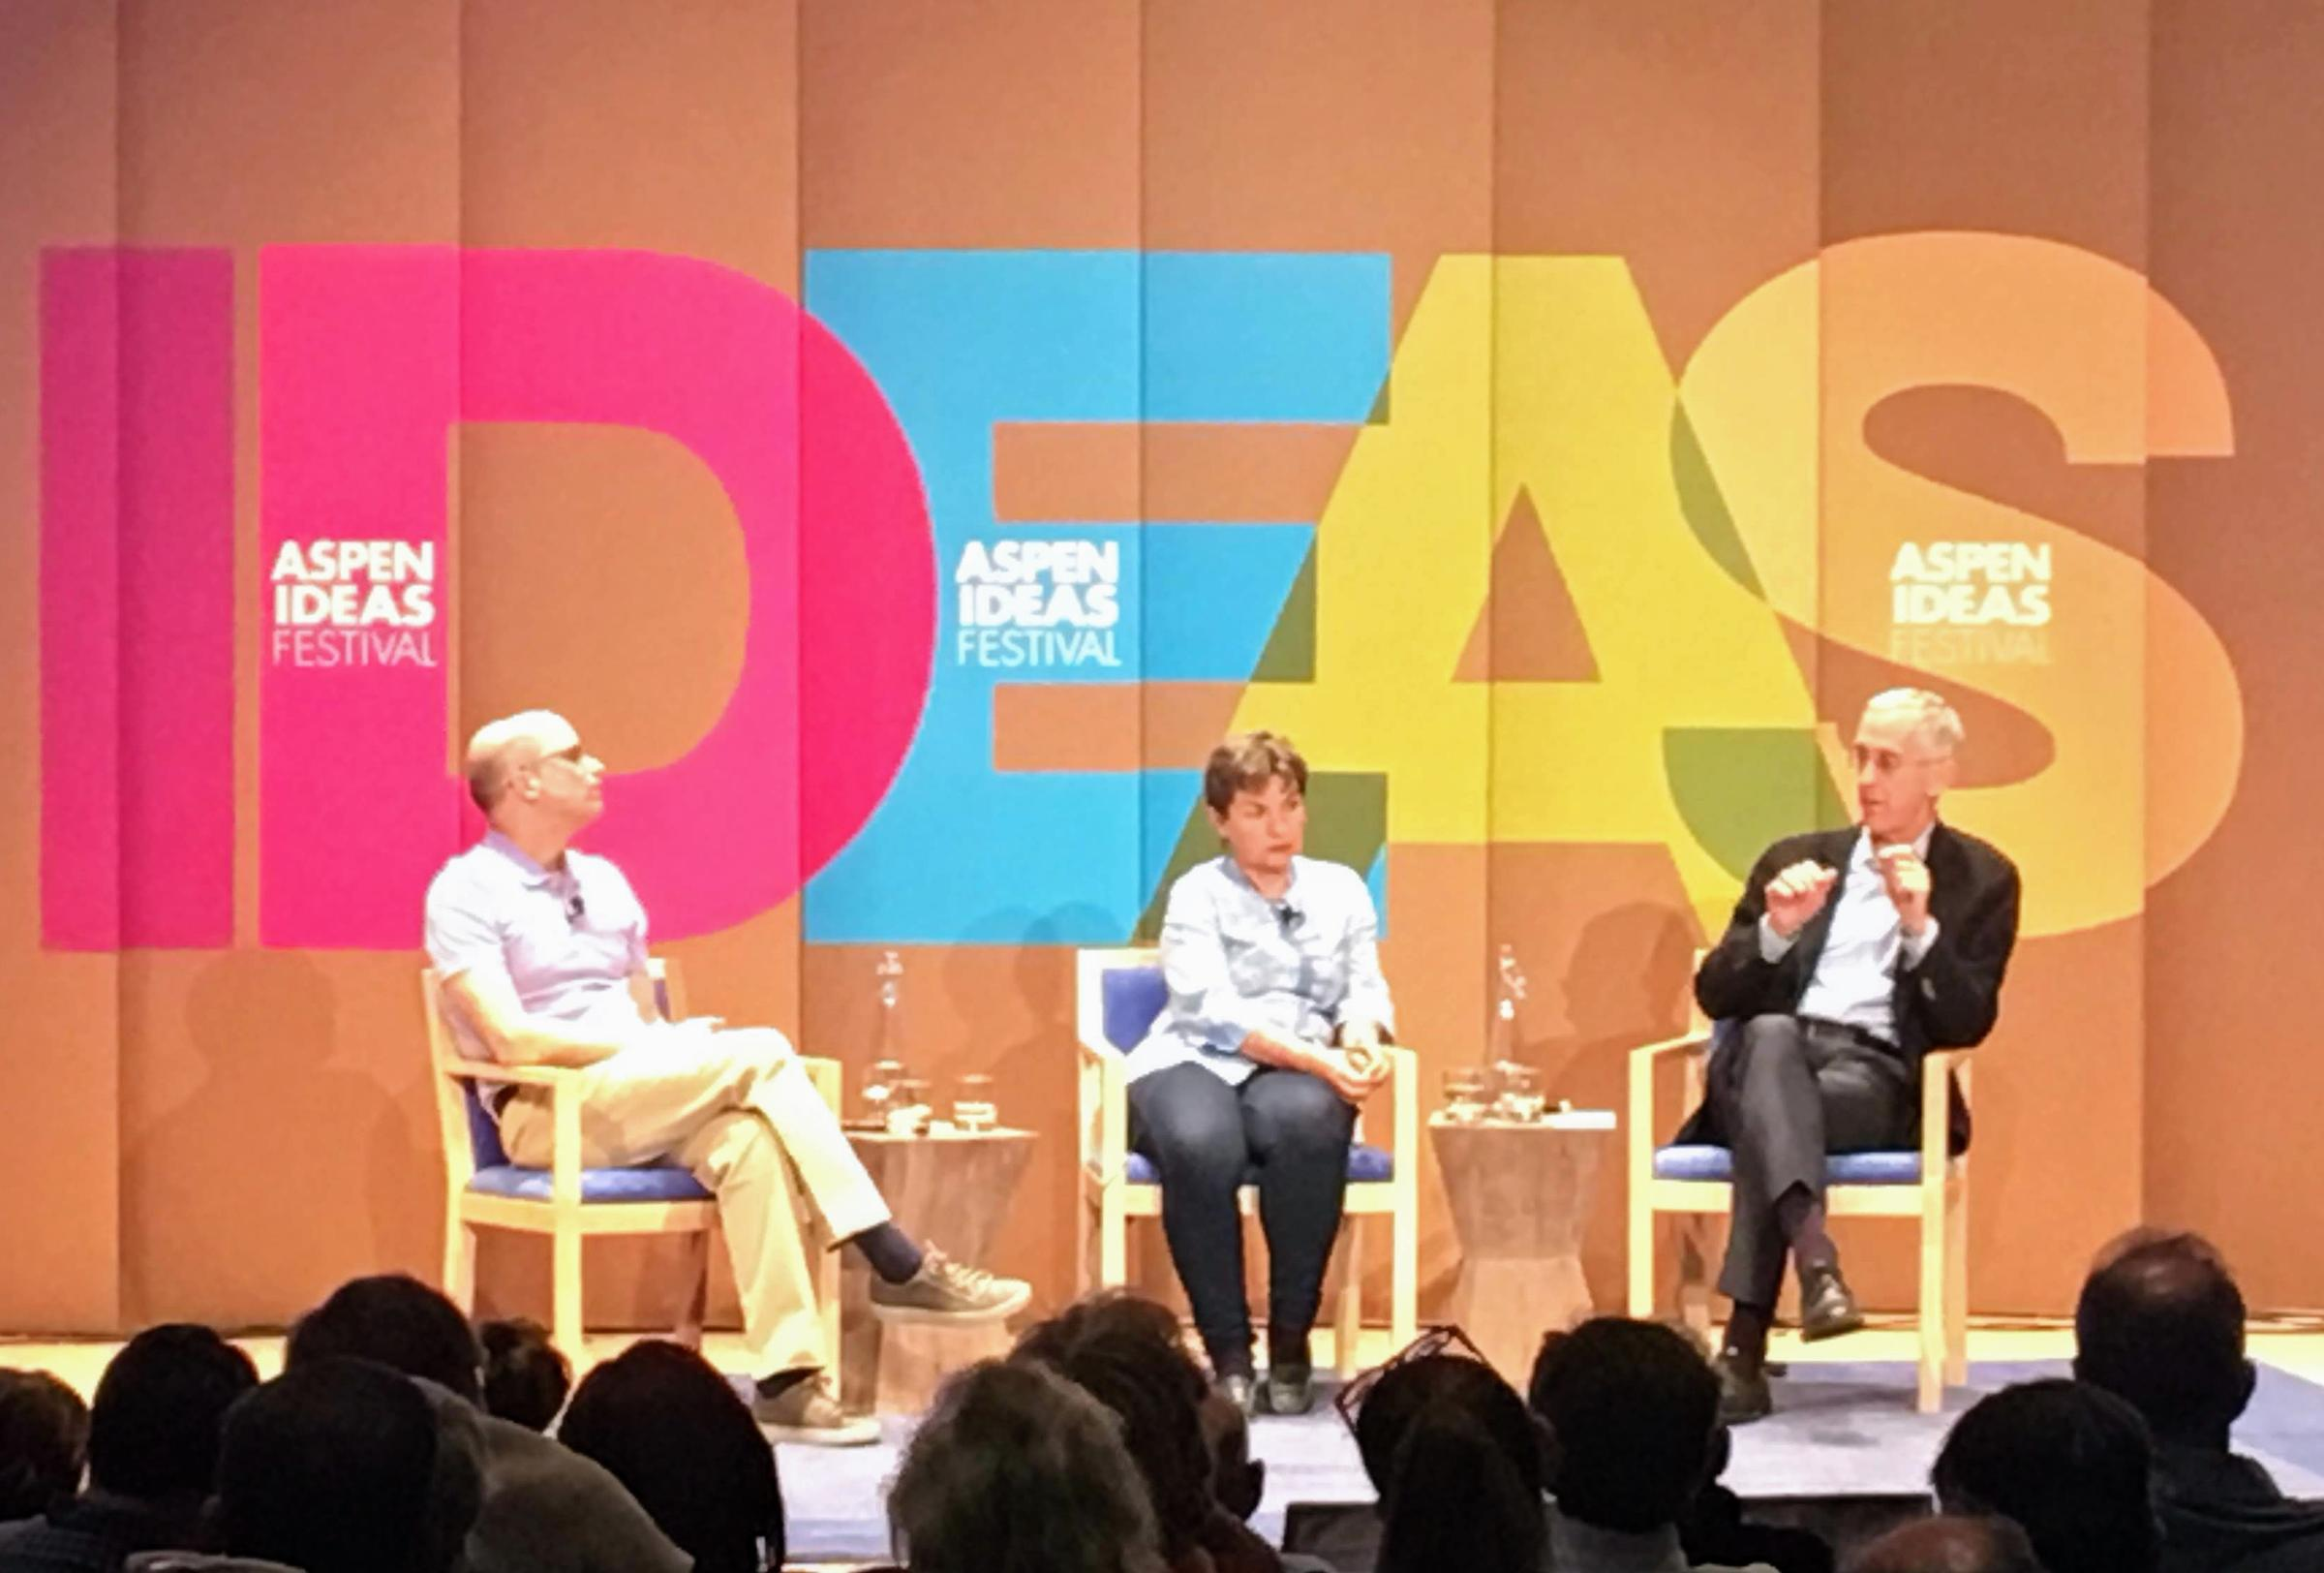 Aspen Jazz Festival 2020 Aspen Ideas Festival 2018: Leading On Climate | Aspen Public Radio